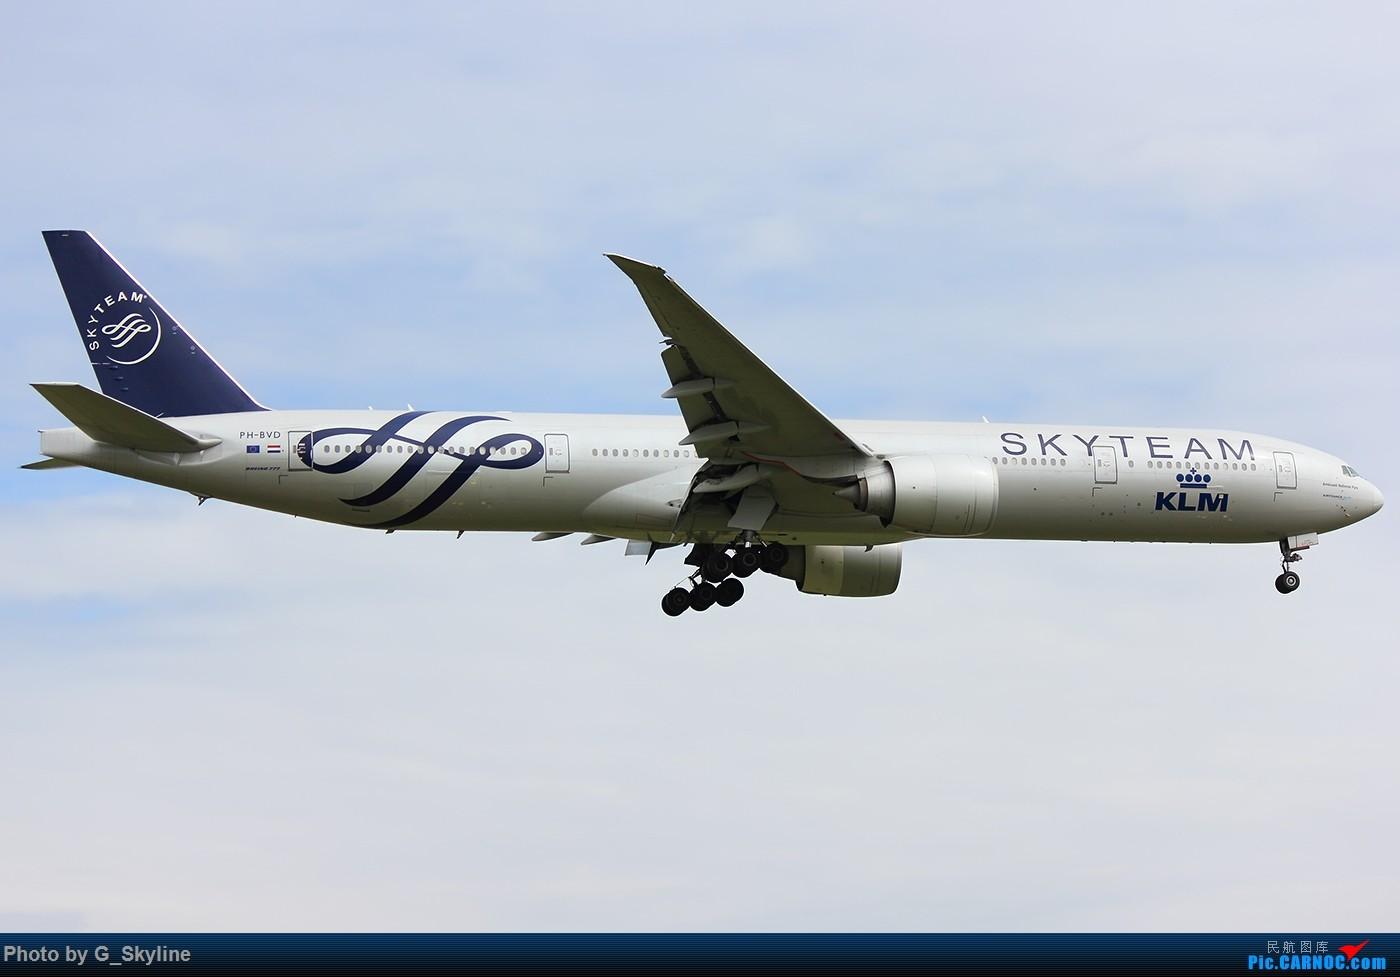 Re:[原创]天合联盟陪你十五载,大合集,张张经典,不重复 BOEING 777-300ER PH-BVD 荷兰阿姆斯特丹斯史基浦(西霍普)机场